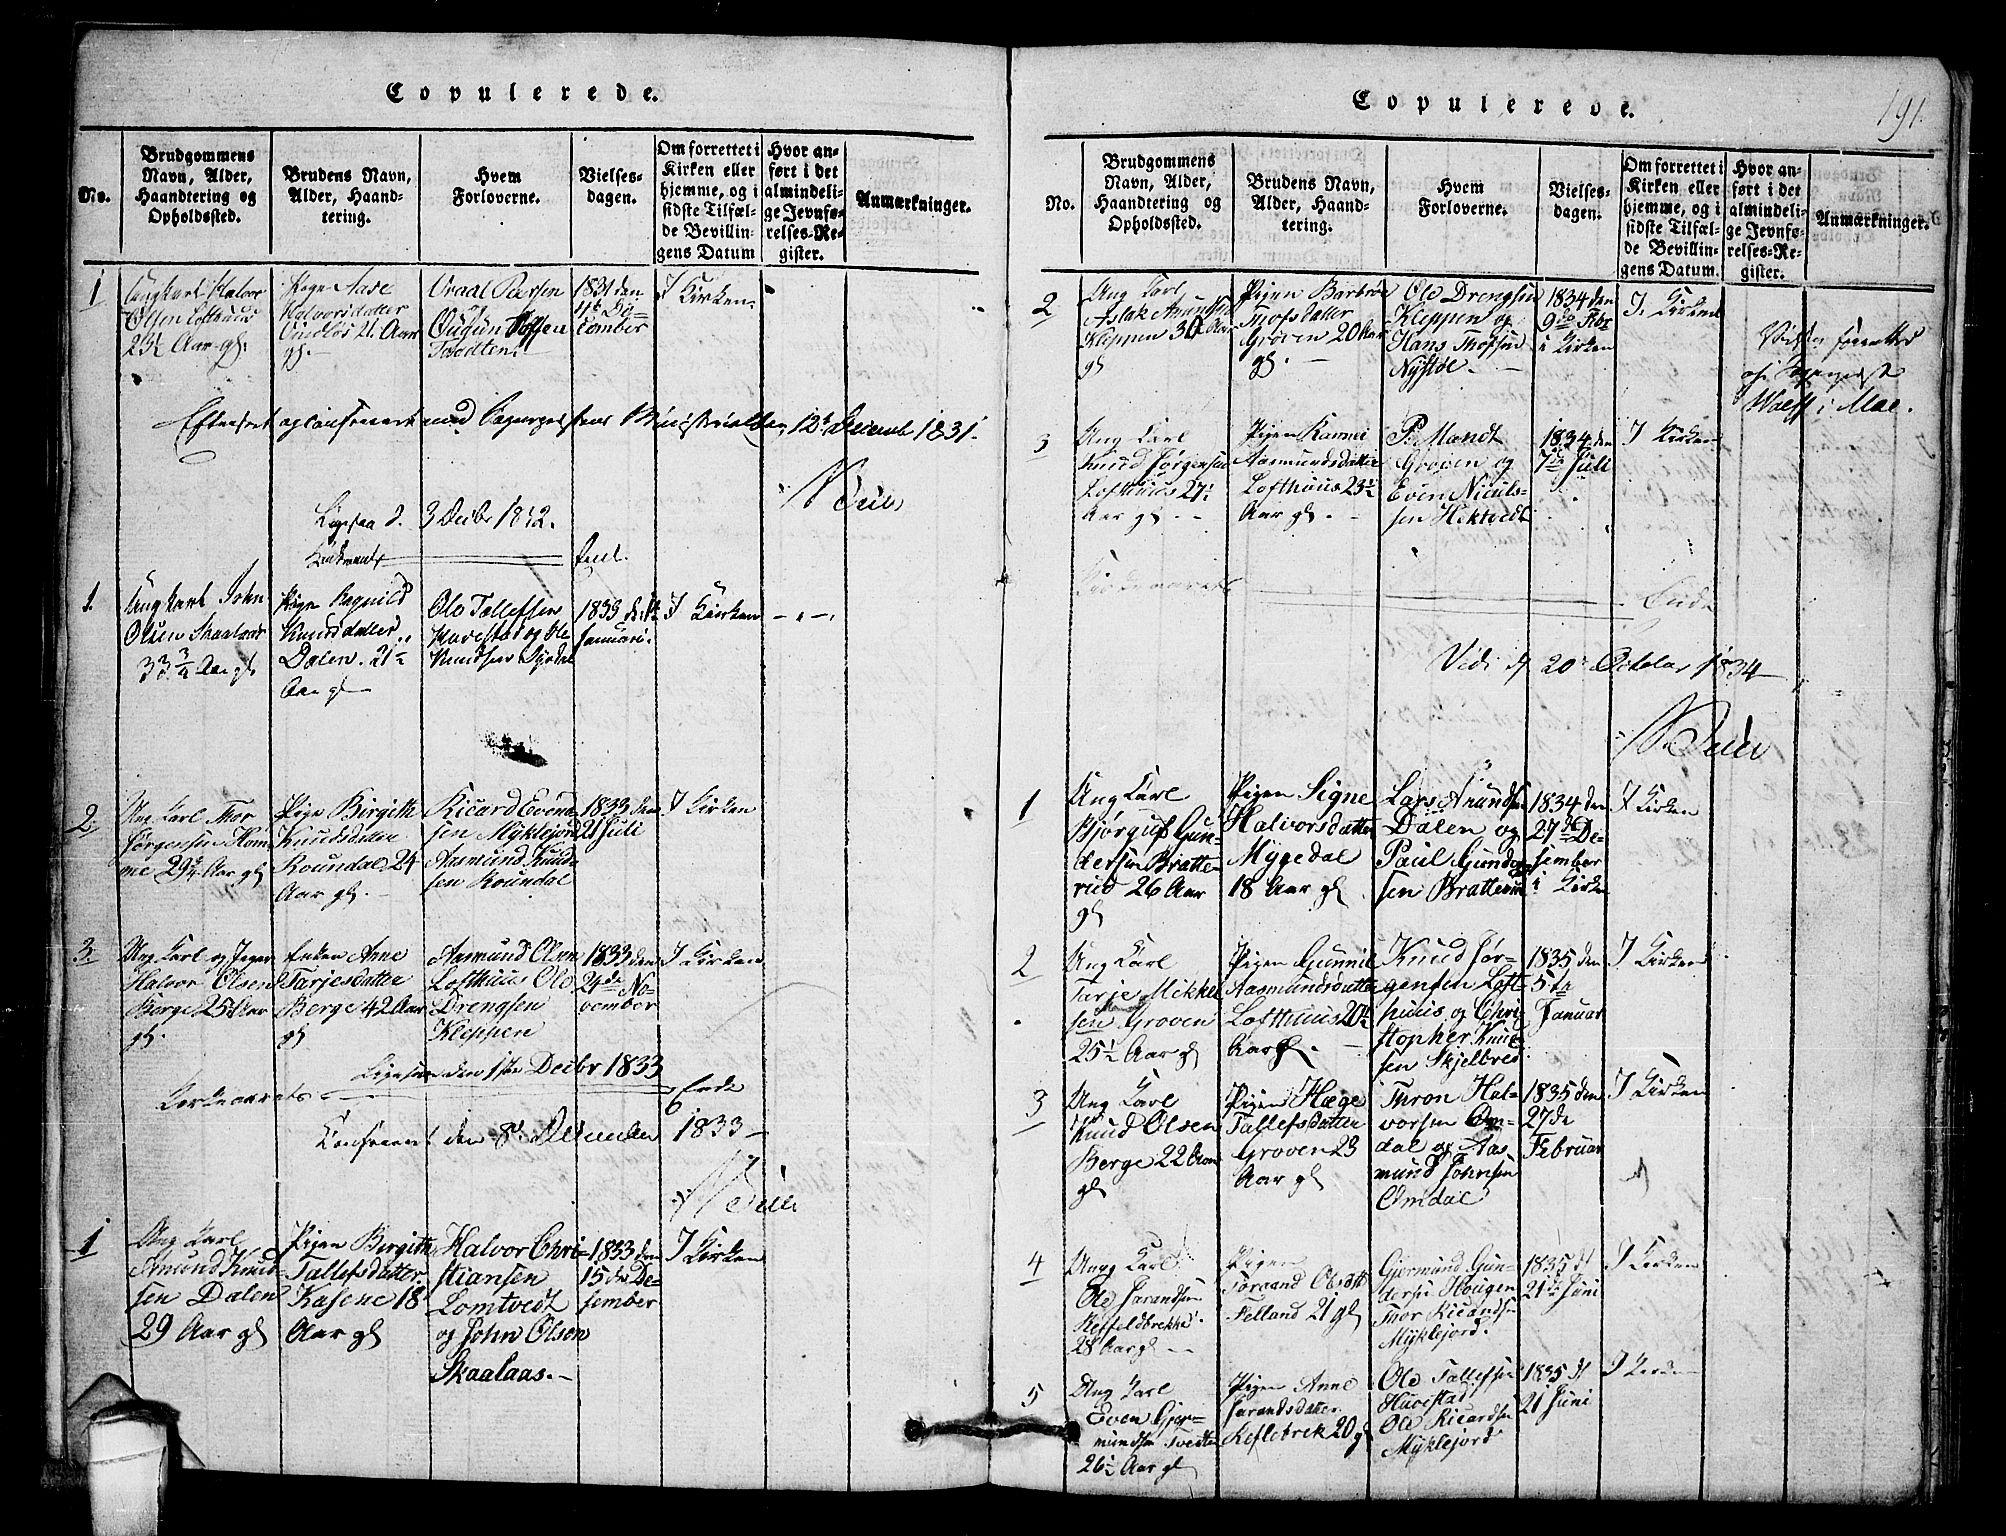 SAKO, Lårdal kirkebøker, G/Gb/L0001: Klokkerbok nr. II 1, 1815-1865, s. 191